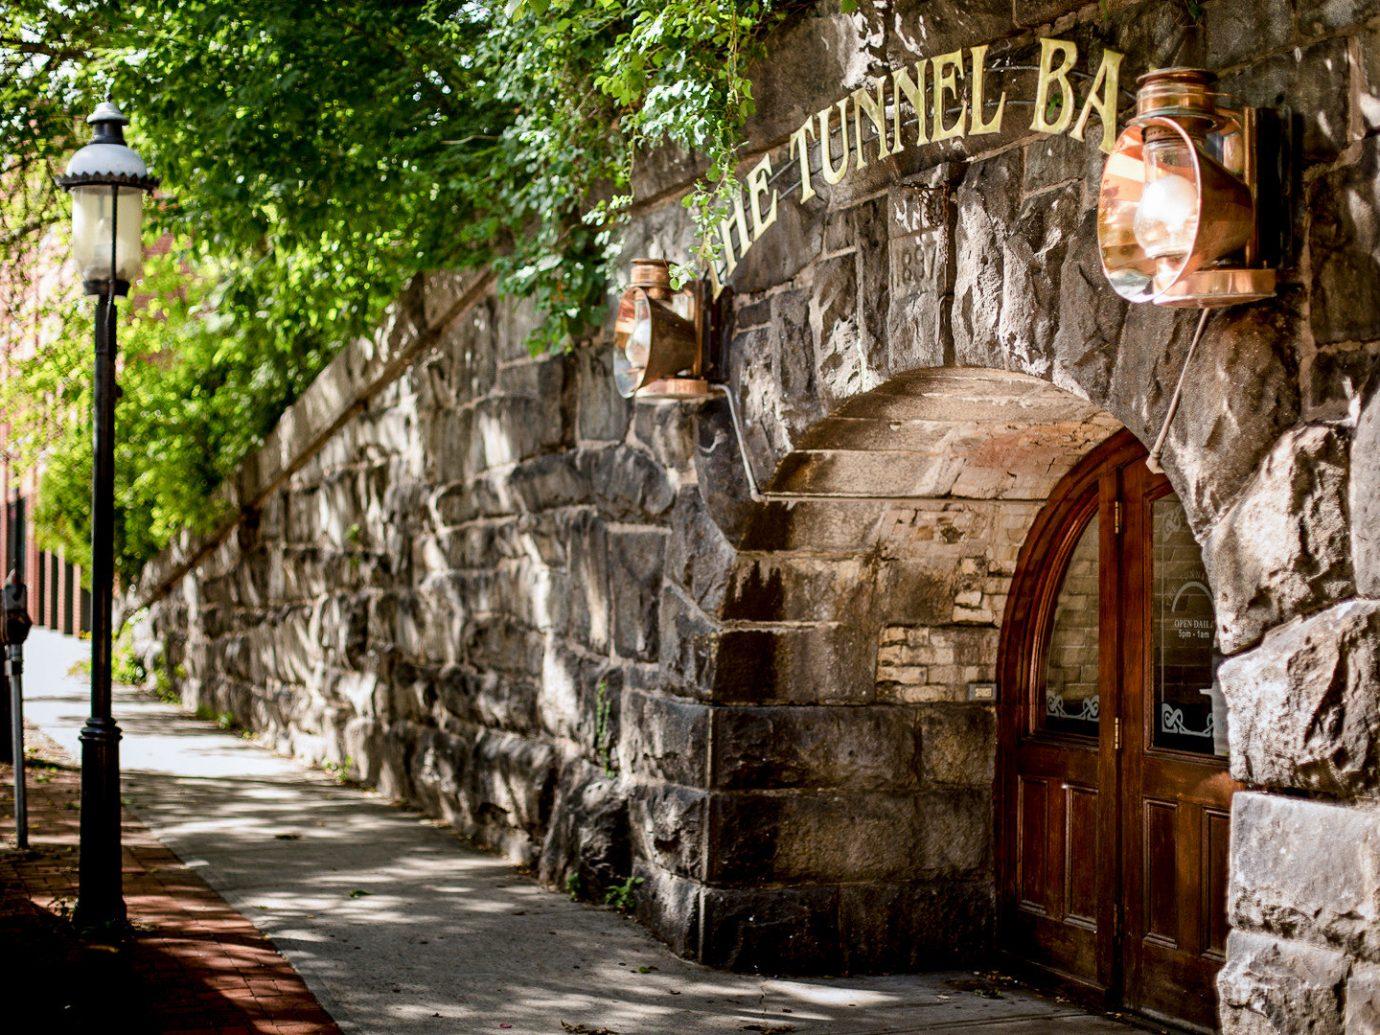 Boutique Hotels Fall Hotels Outdoors + Adventure Trip Ideas Weekend Getaways building outdoor tree way stone street alley arch plant road sidewalk